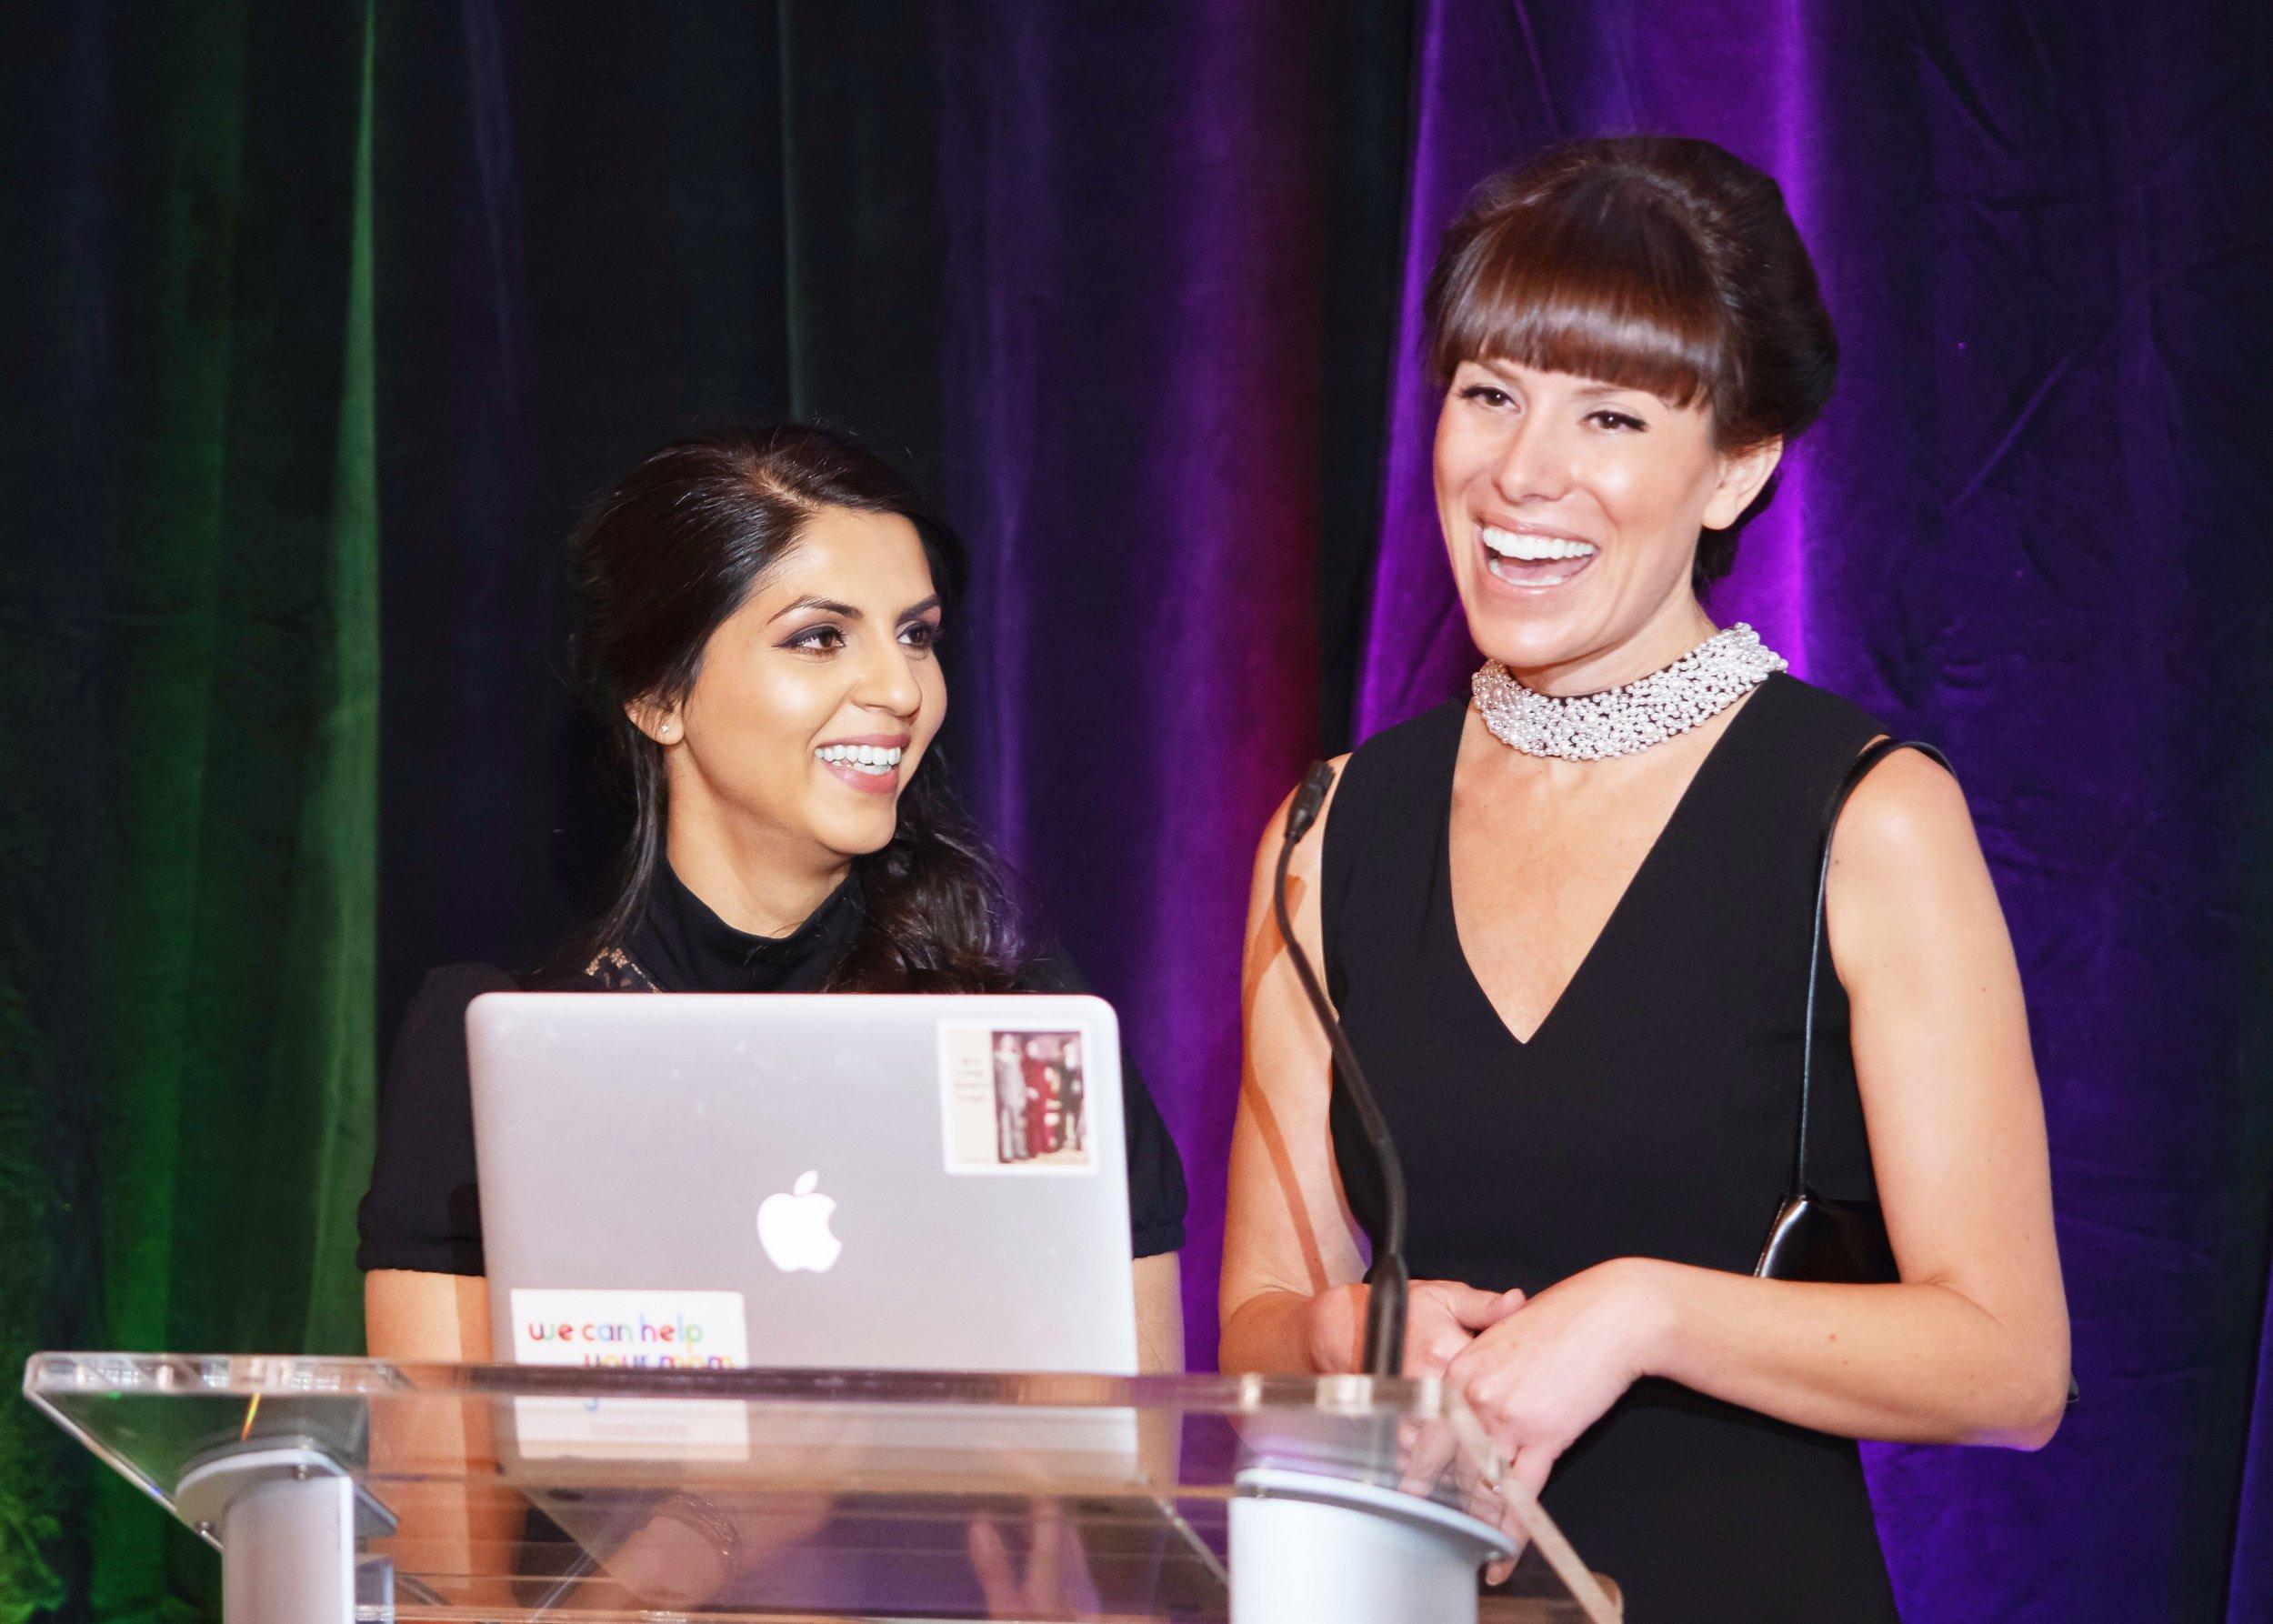 Co-founders Emily & Tasneem